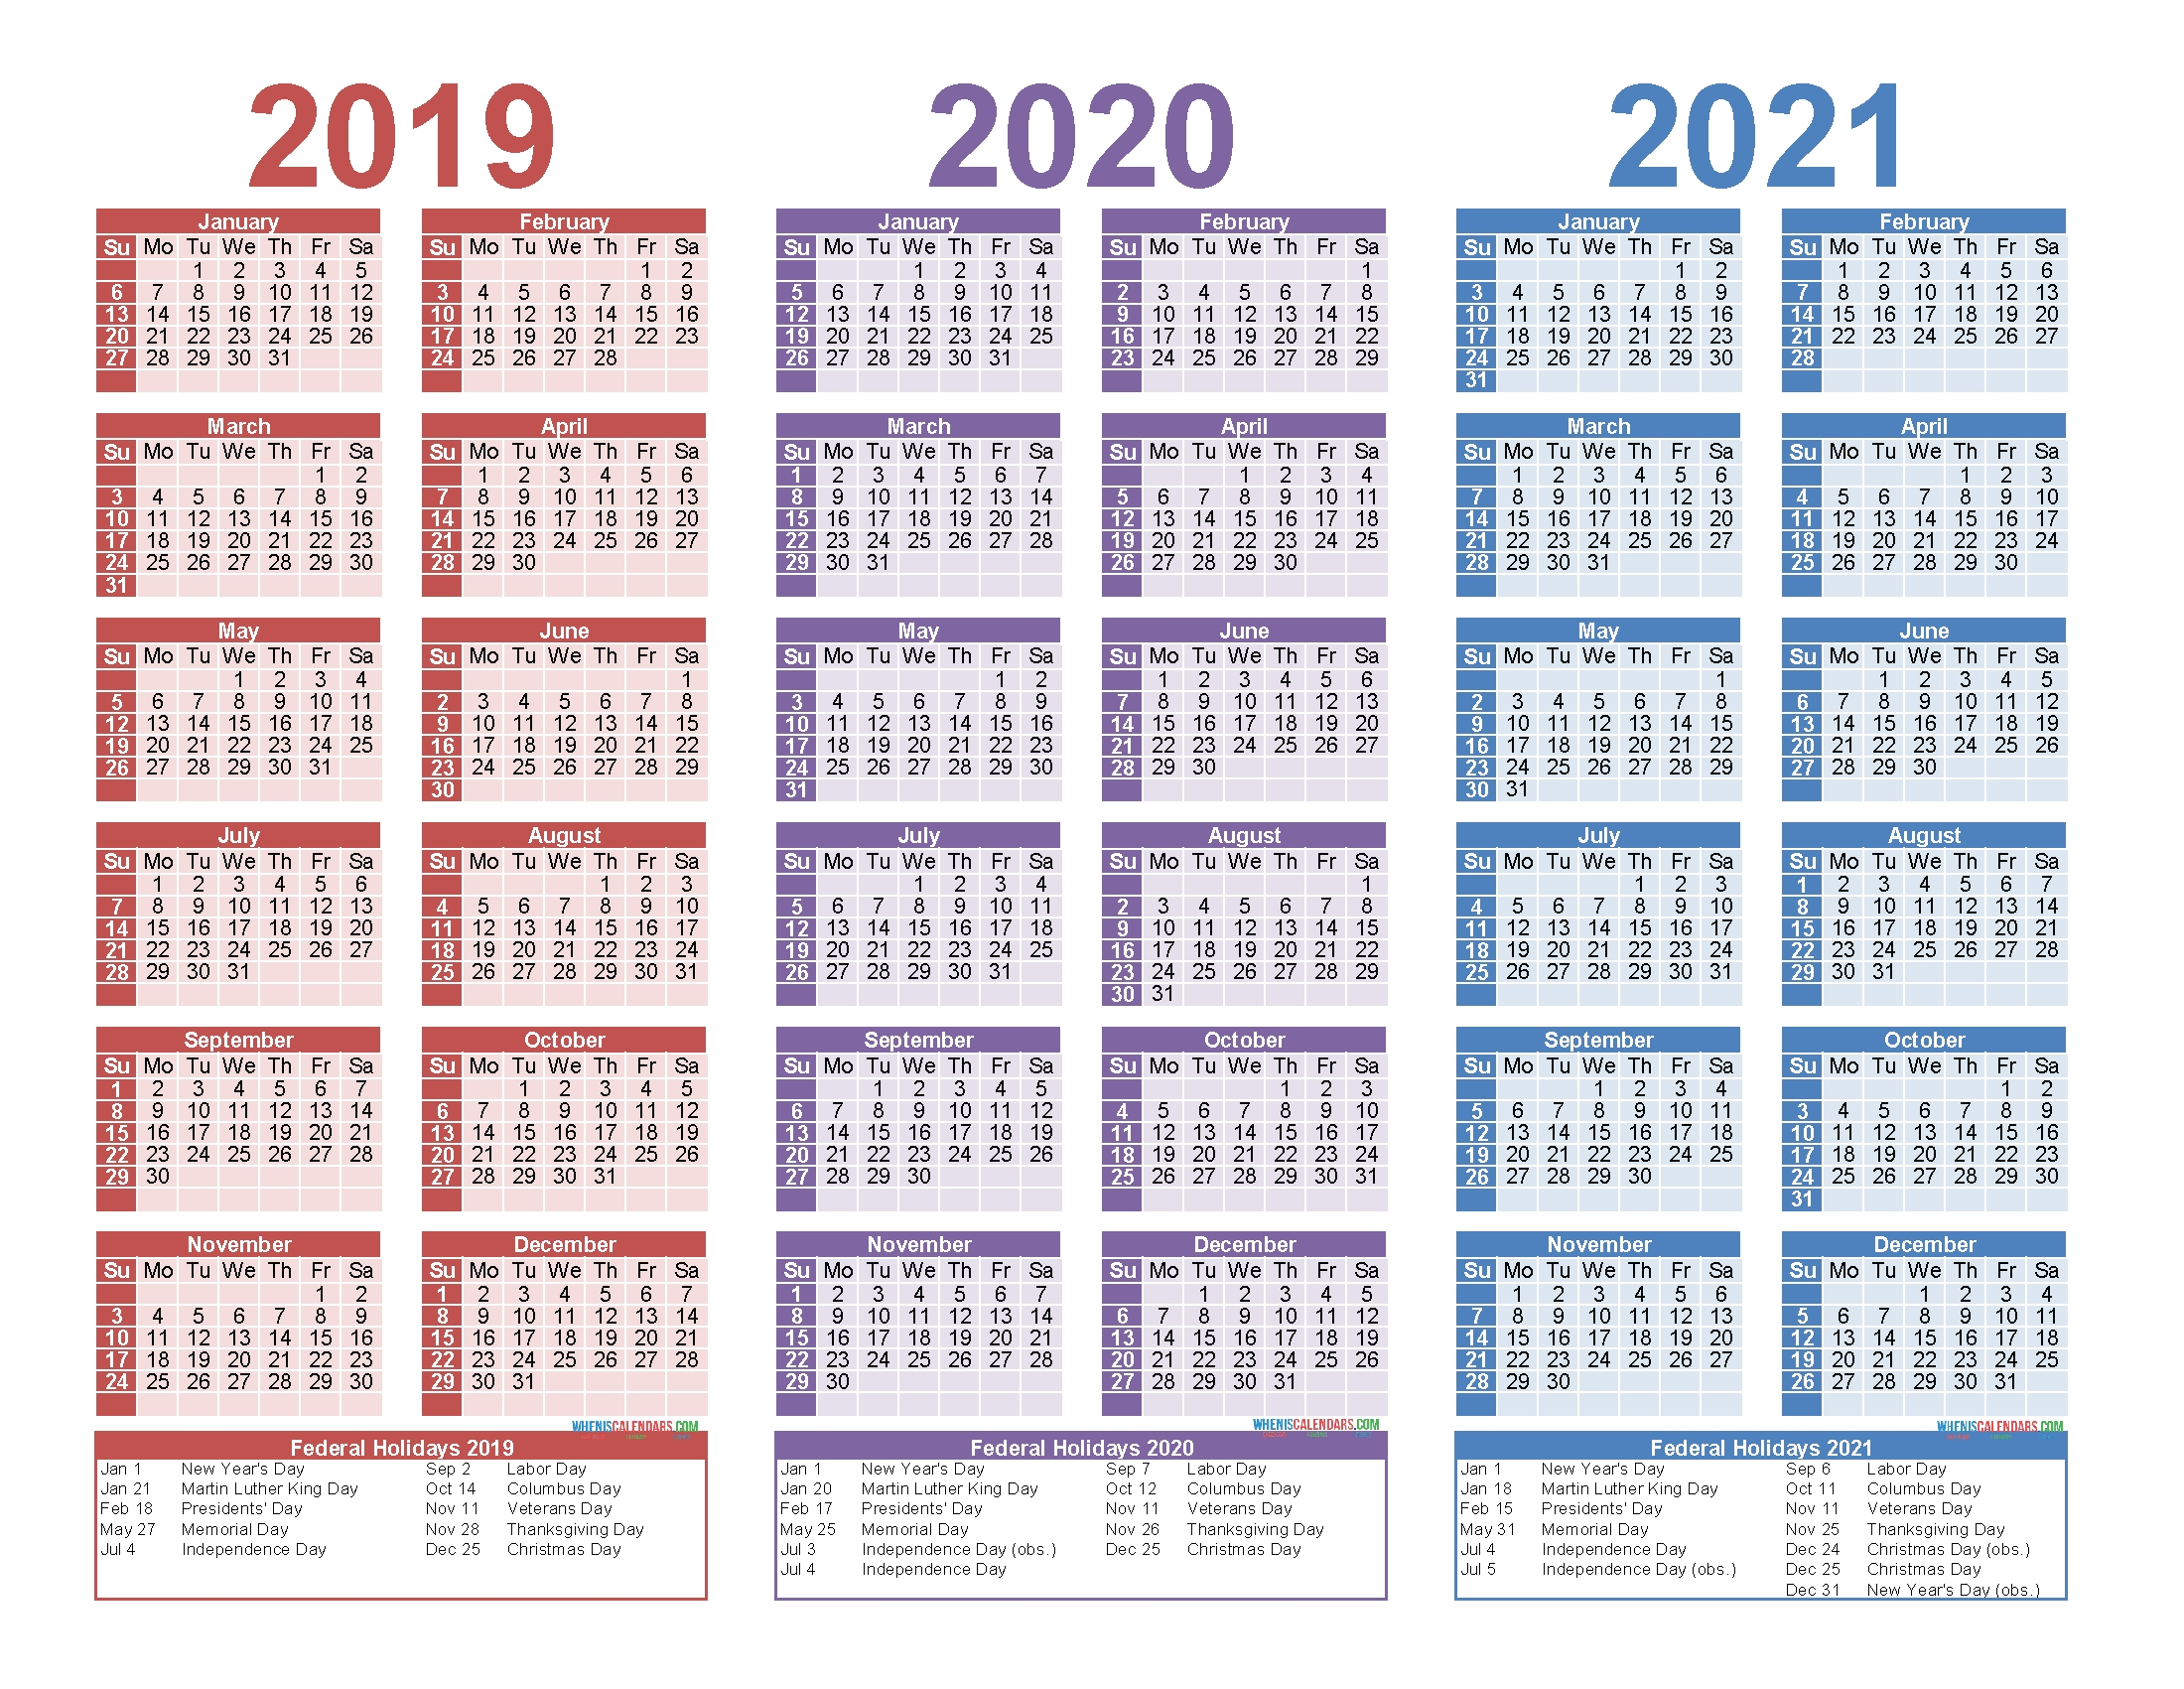 Free Printable 2019 2020 2021 Calendar With Holidays   Free within 2019 2020 2021 Printable Calendar